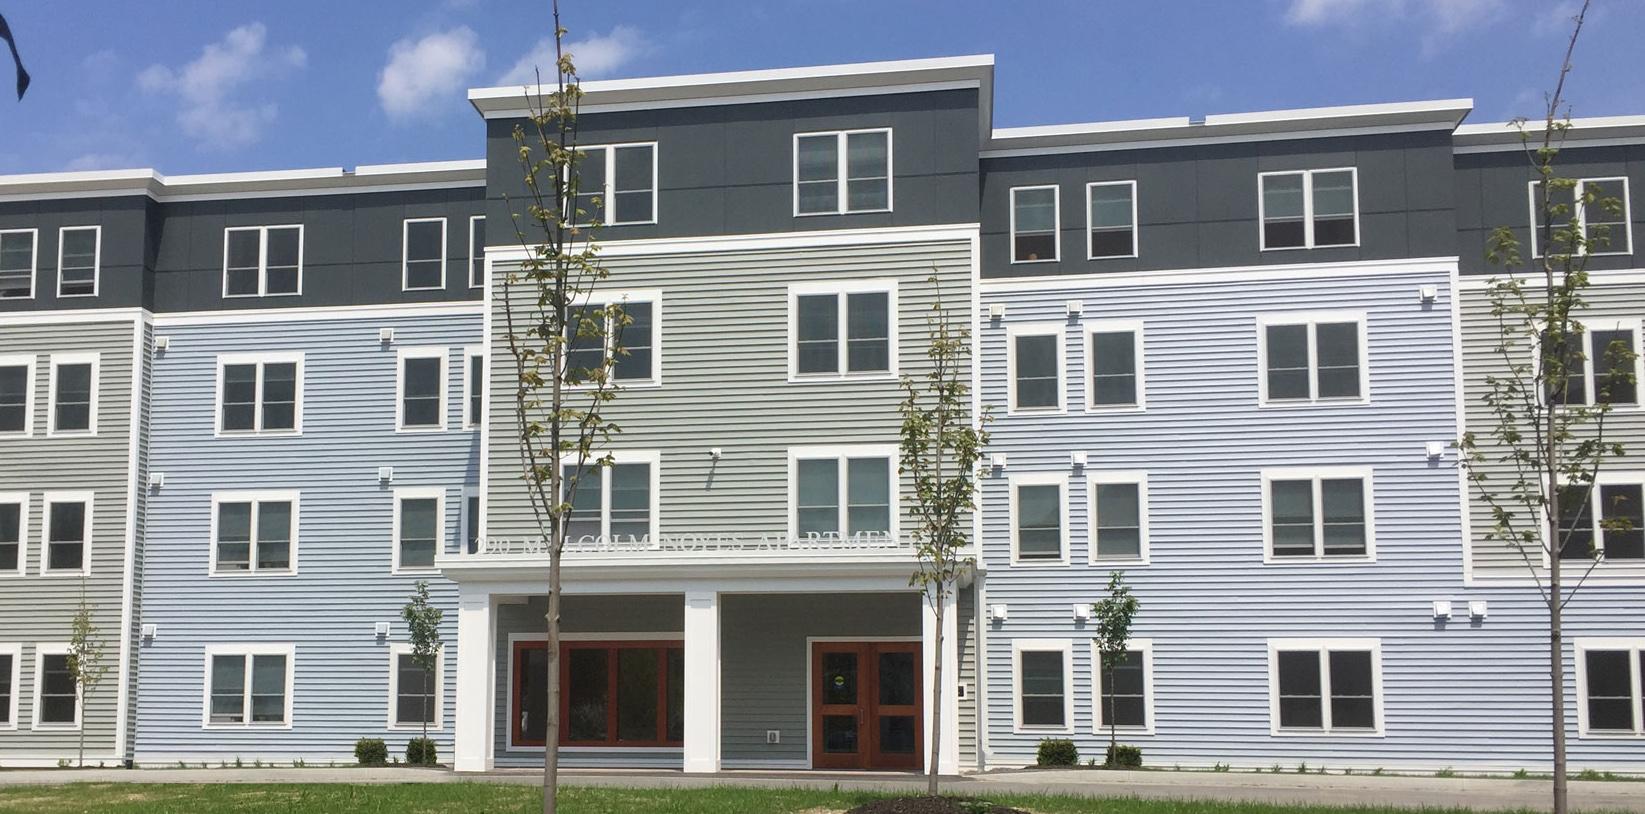 Malcolm A. Noyes Apartments At Millbrook Estates